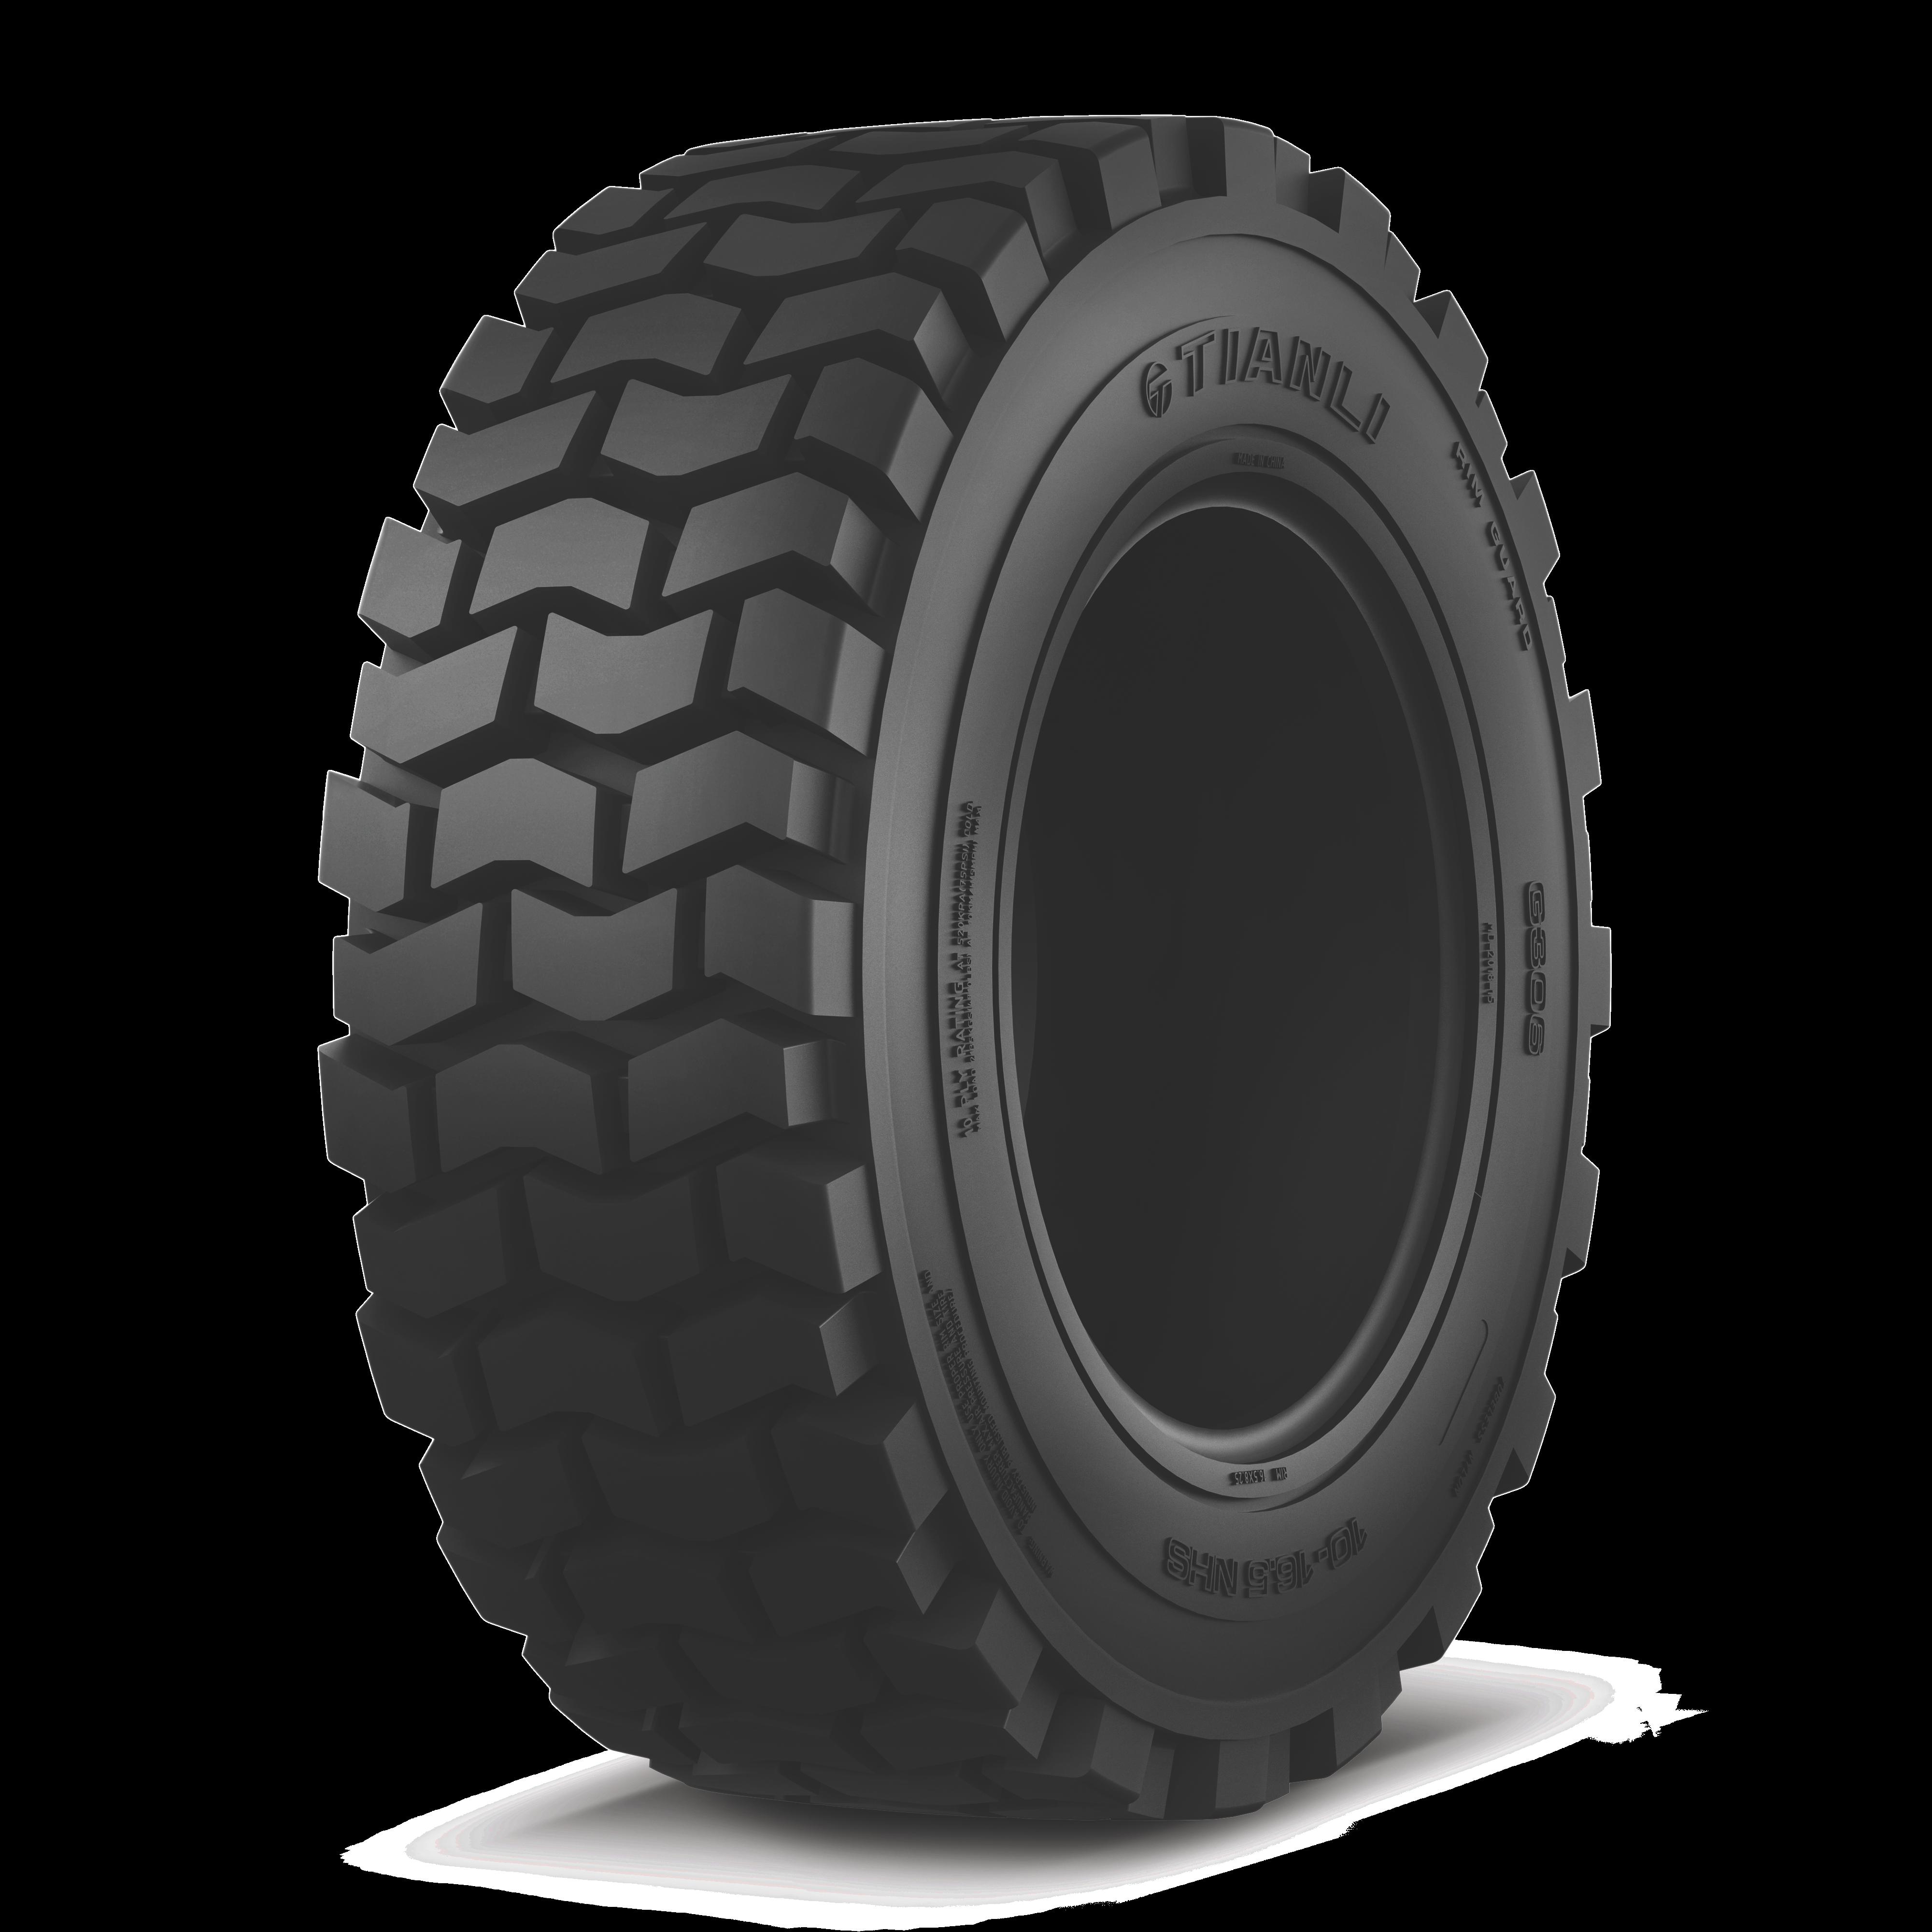 Tianli OTR Tires Target Many Applications